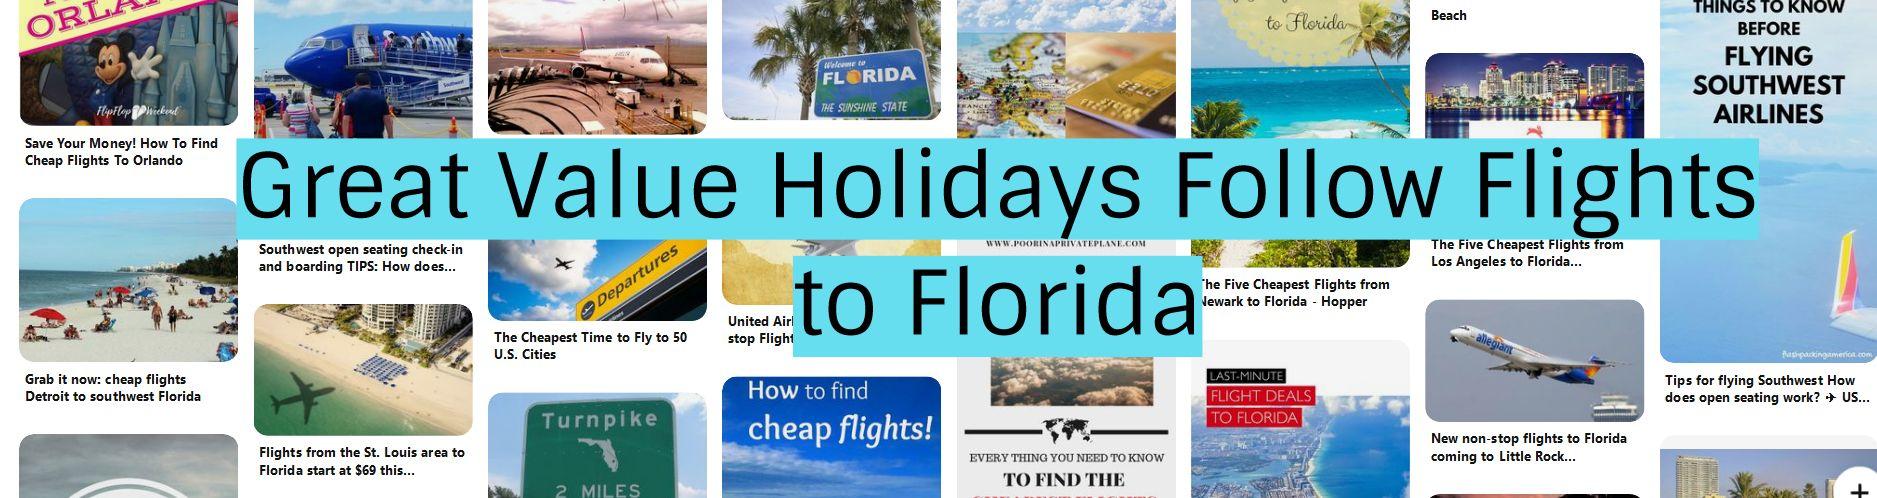 Great Value Holidays Follow Flights to Florida